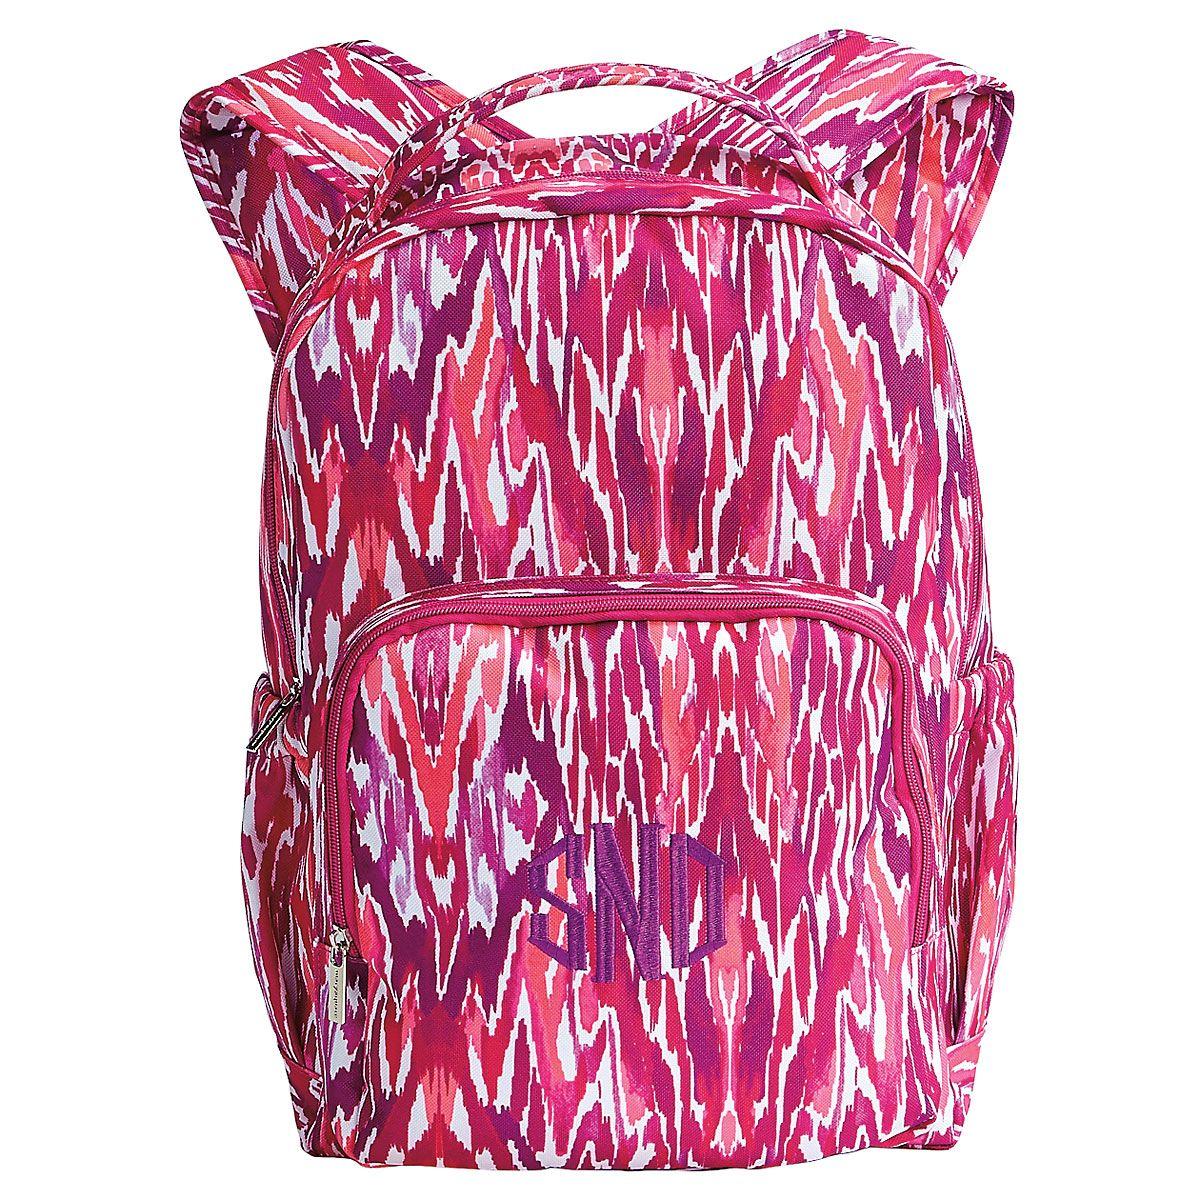 Fuschia Tribal Backpack - Monogram